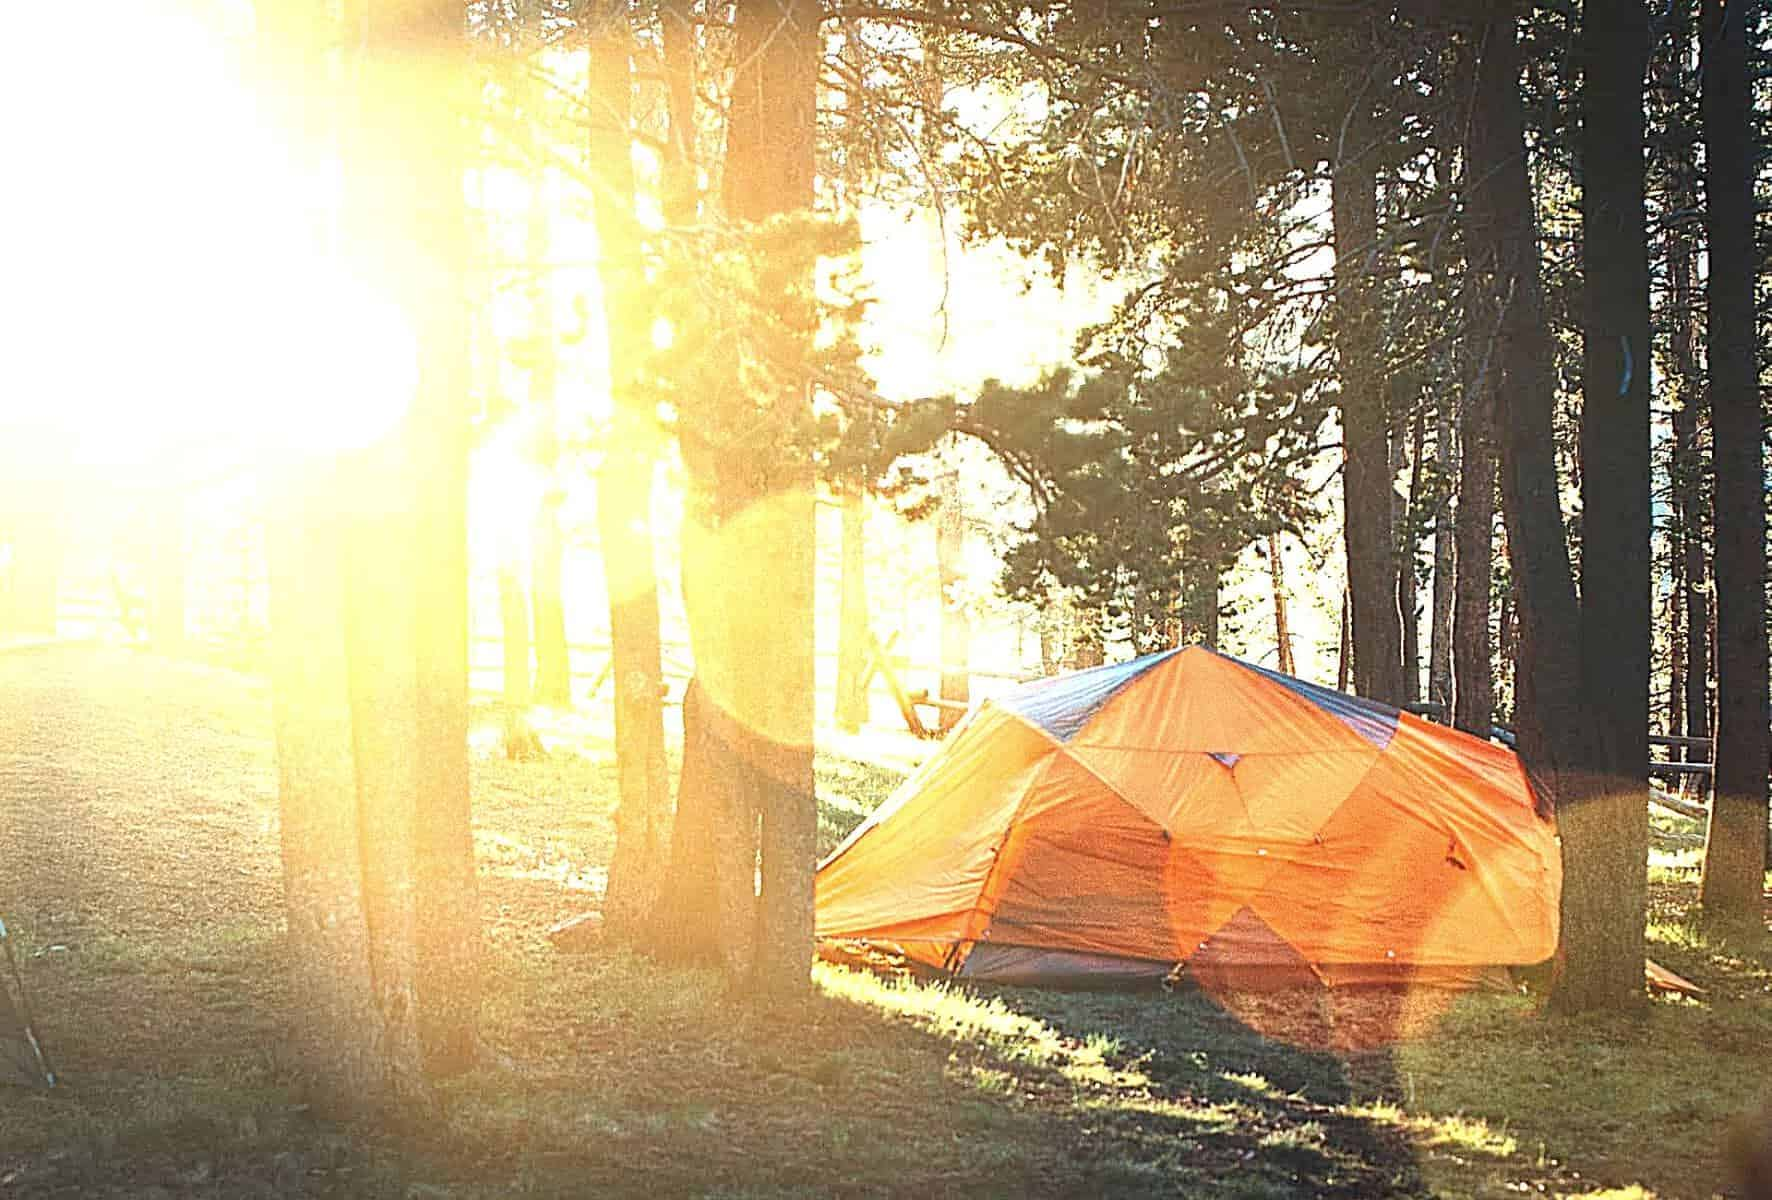 Best instant tent featimage